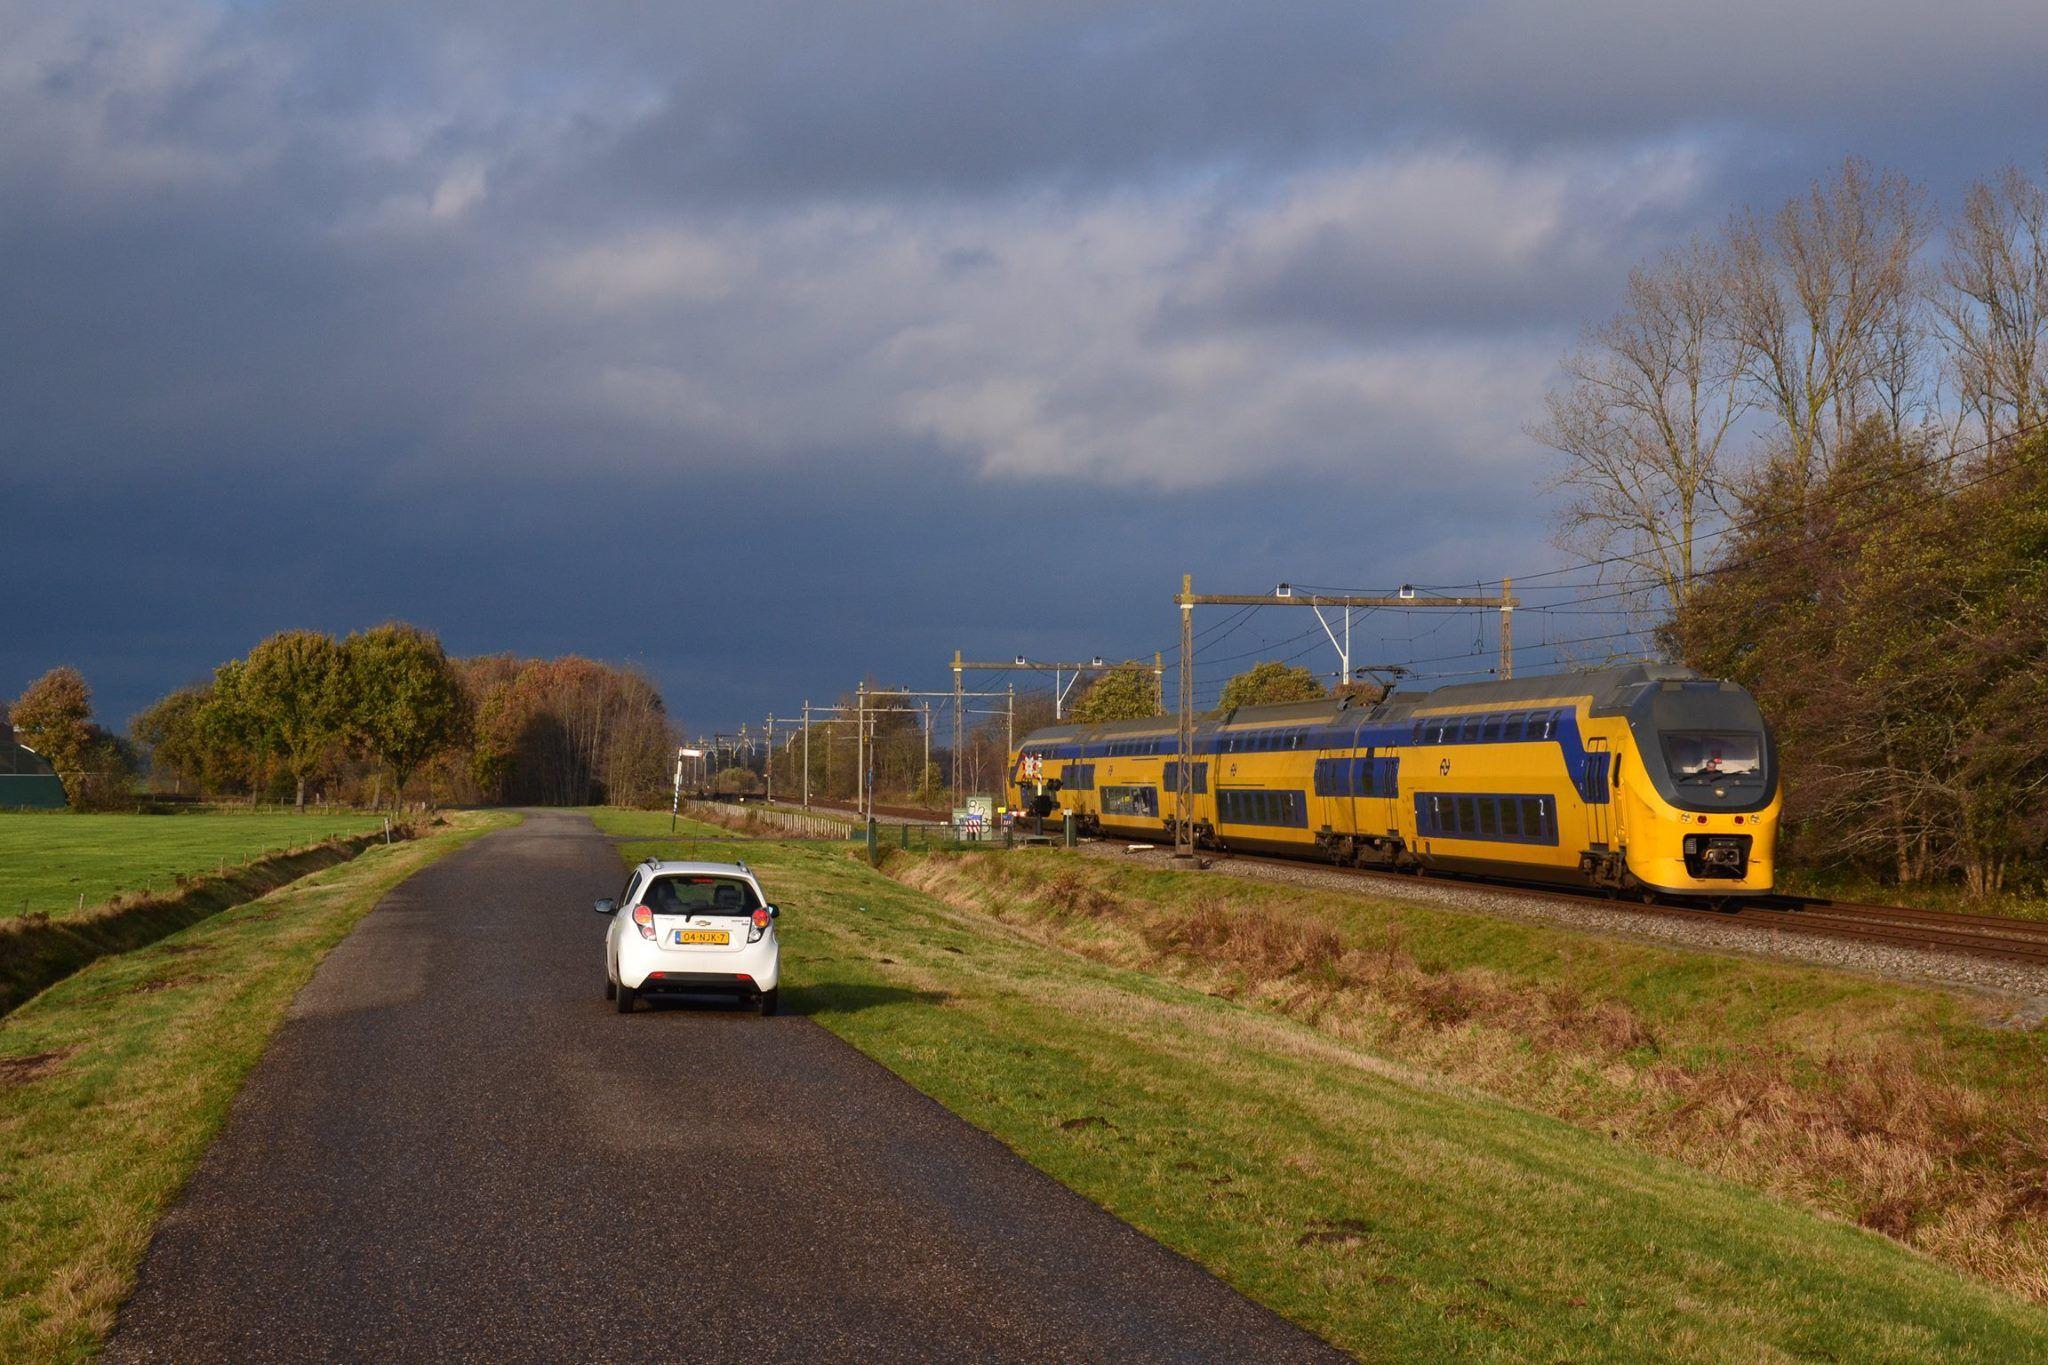 Trein 750 (Gn-Gvc) met stel 9569 om 13.56 uur langs De Punt.